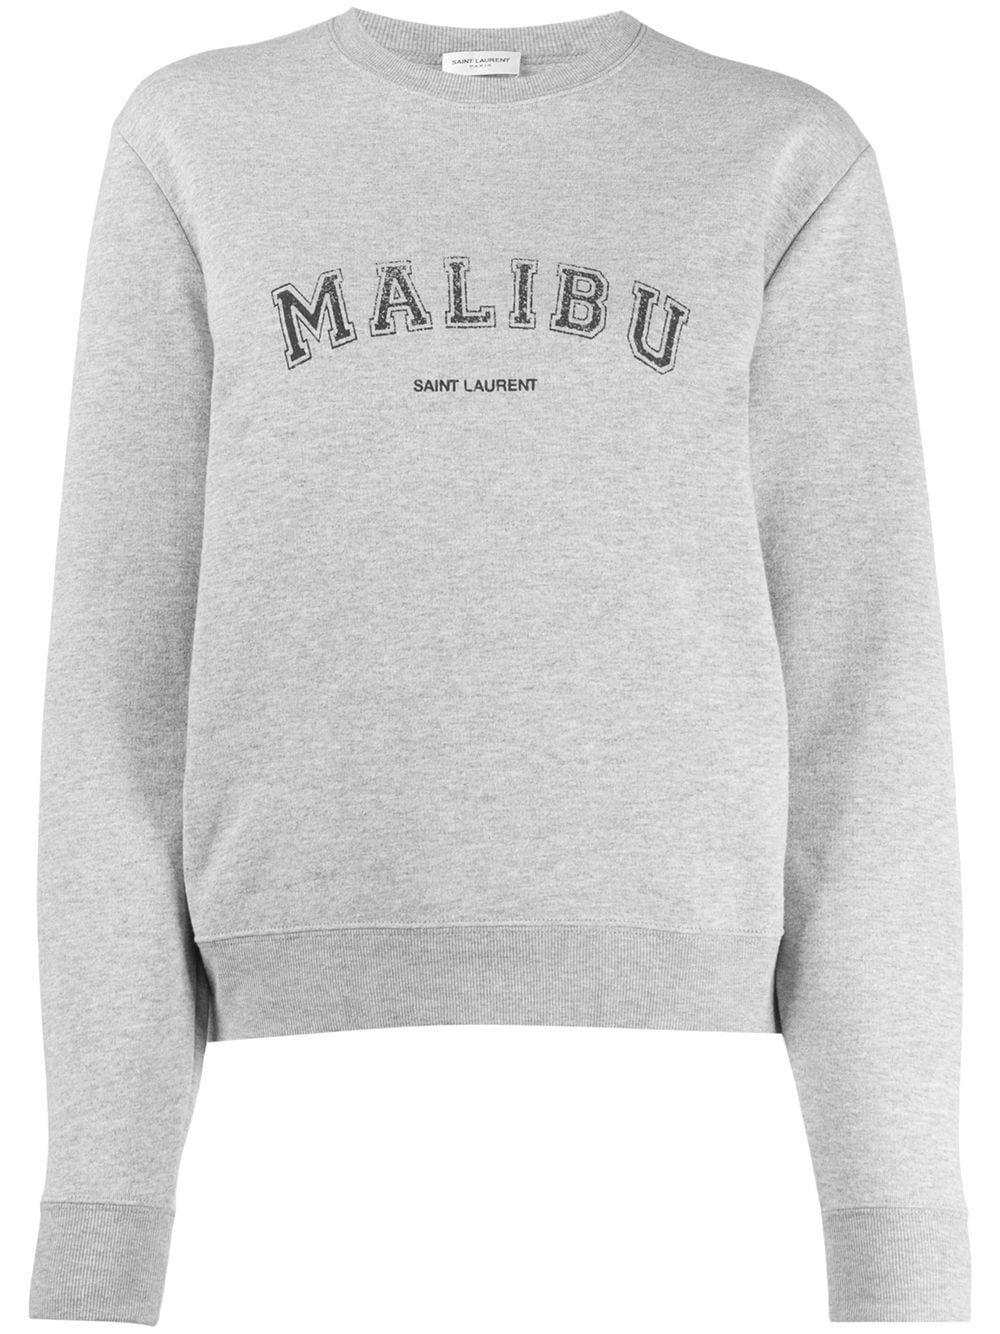 Pin By Aisha On ملابس In 2021 Crew Neck Sweatshirt Sweatshirts Saint Laurent [ 1334 x 1000 Pixel ]